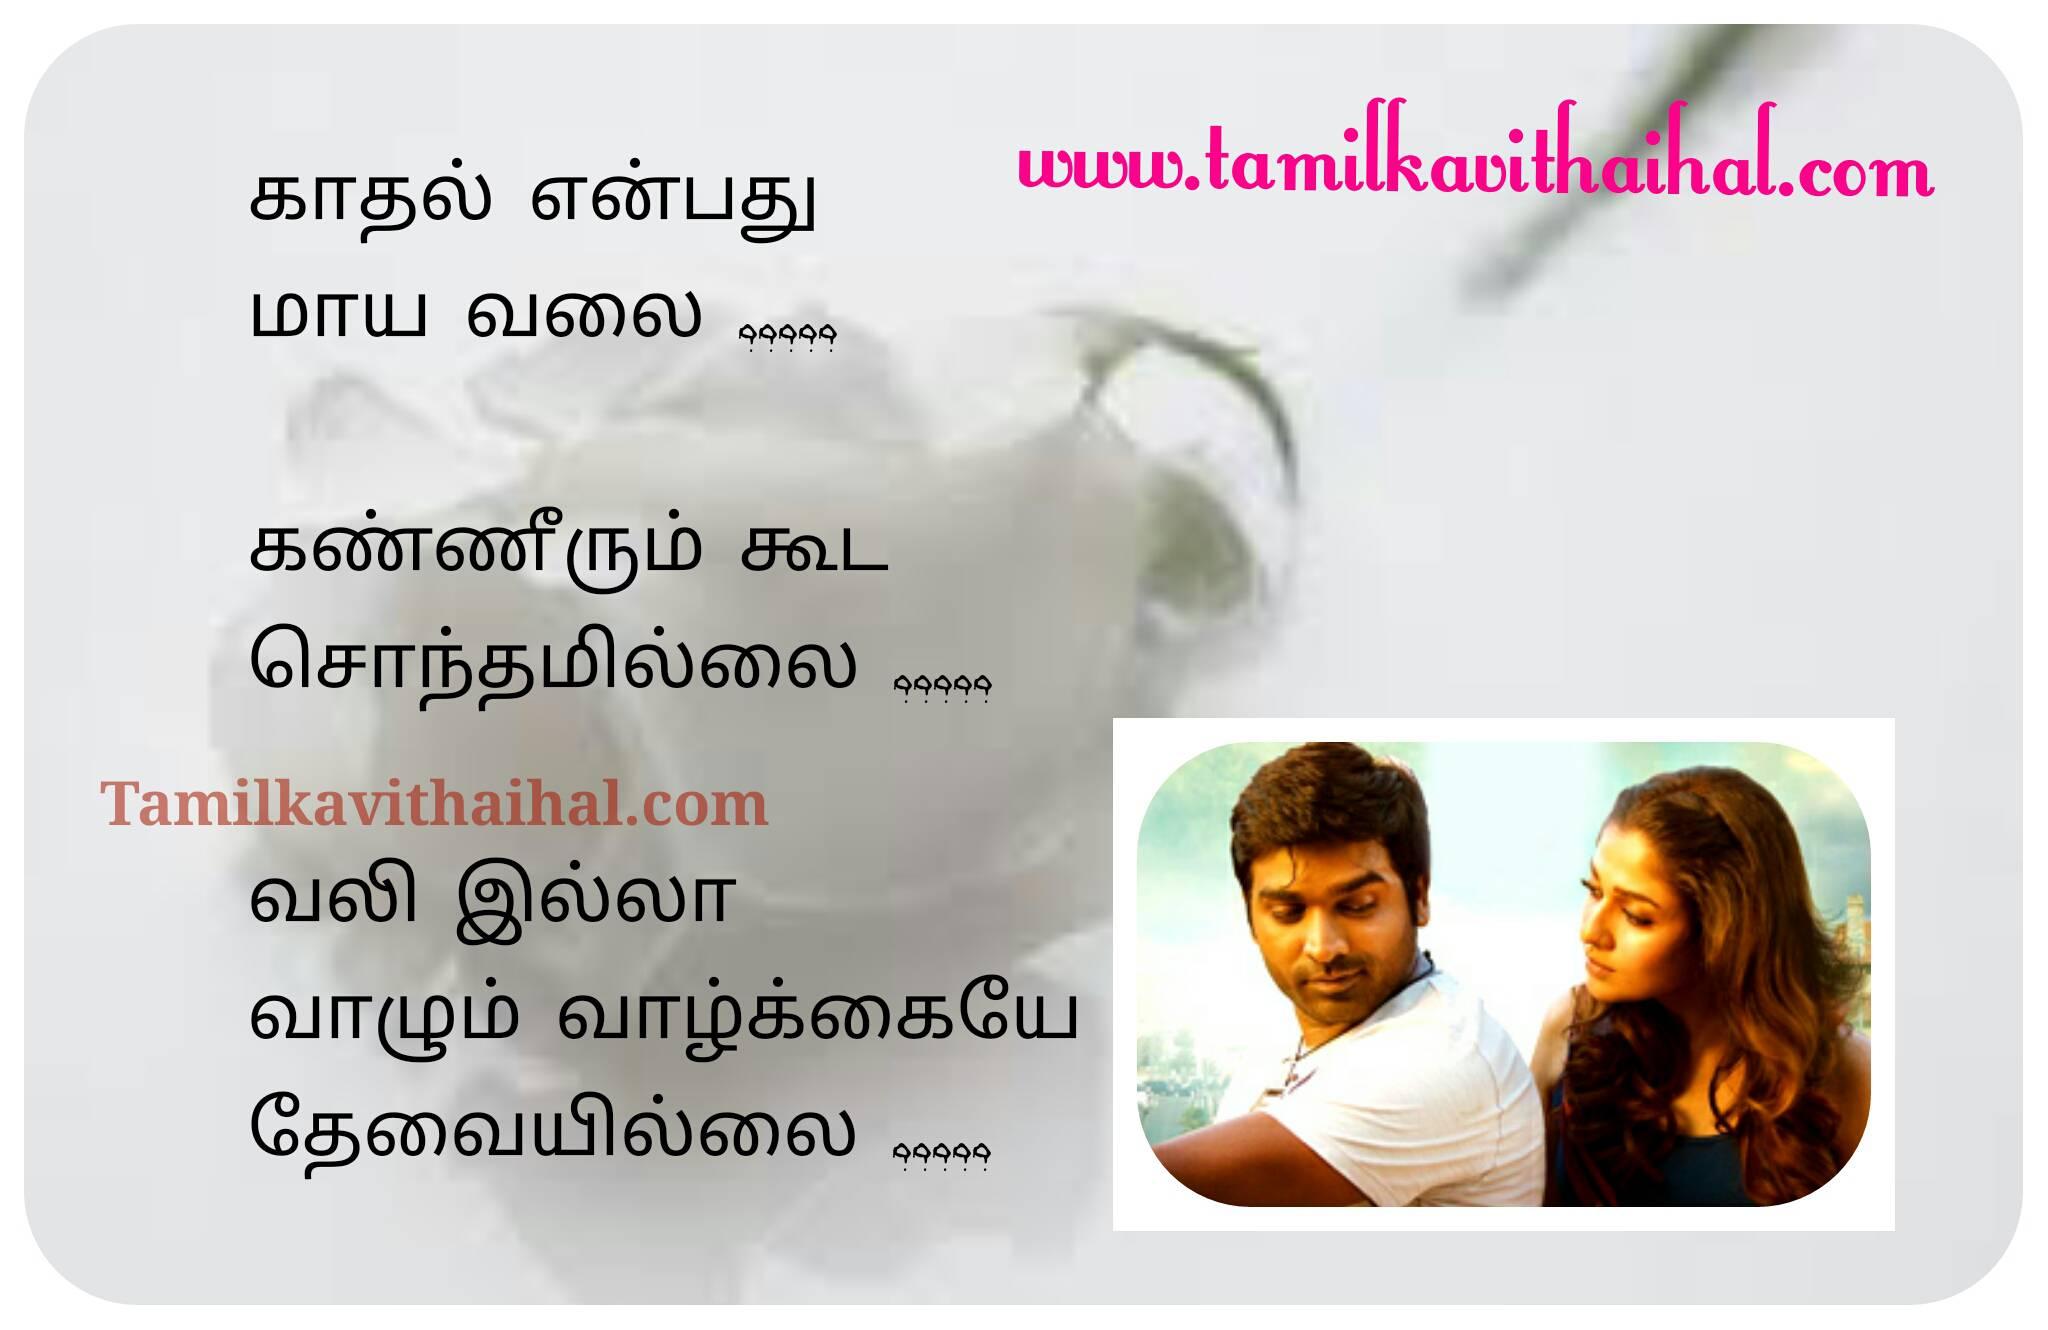 Vijay sethupathi nanum rowdy thaan song kadhal enbathu maya valai kannerum kooda songs lyrics download